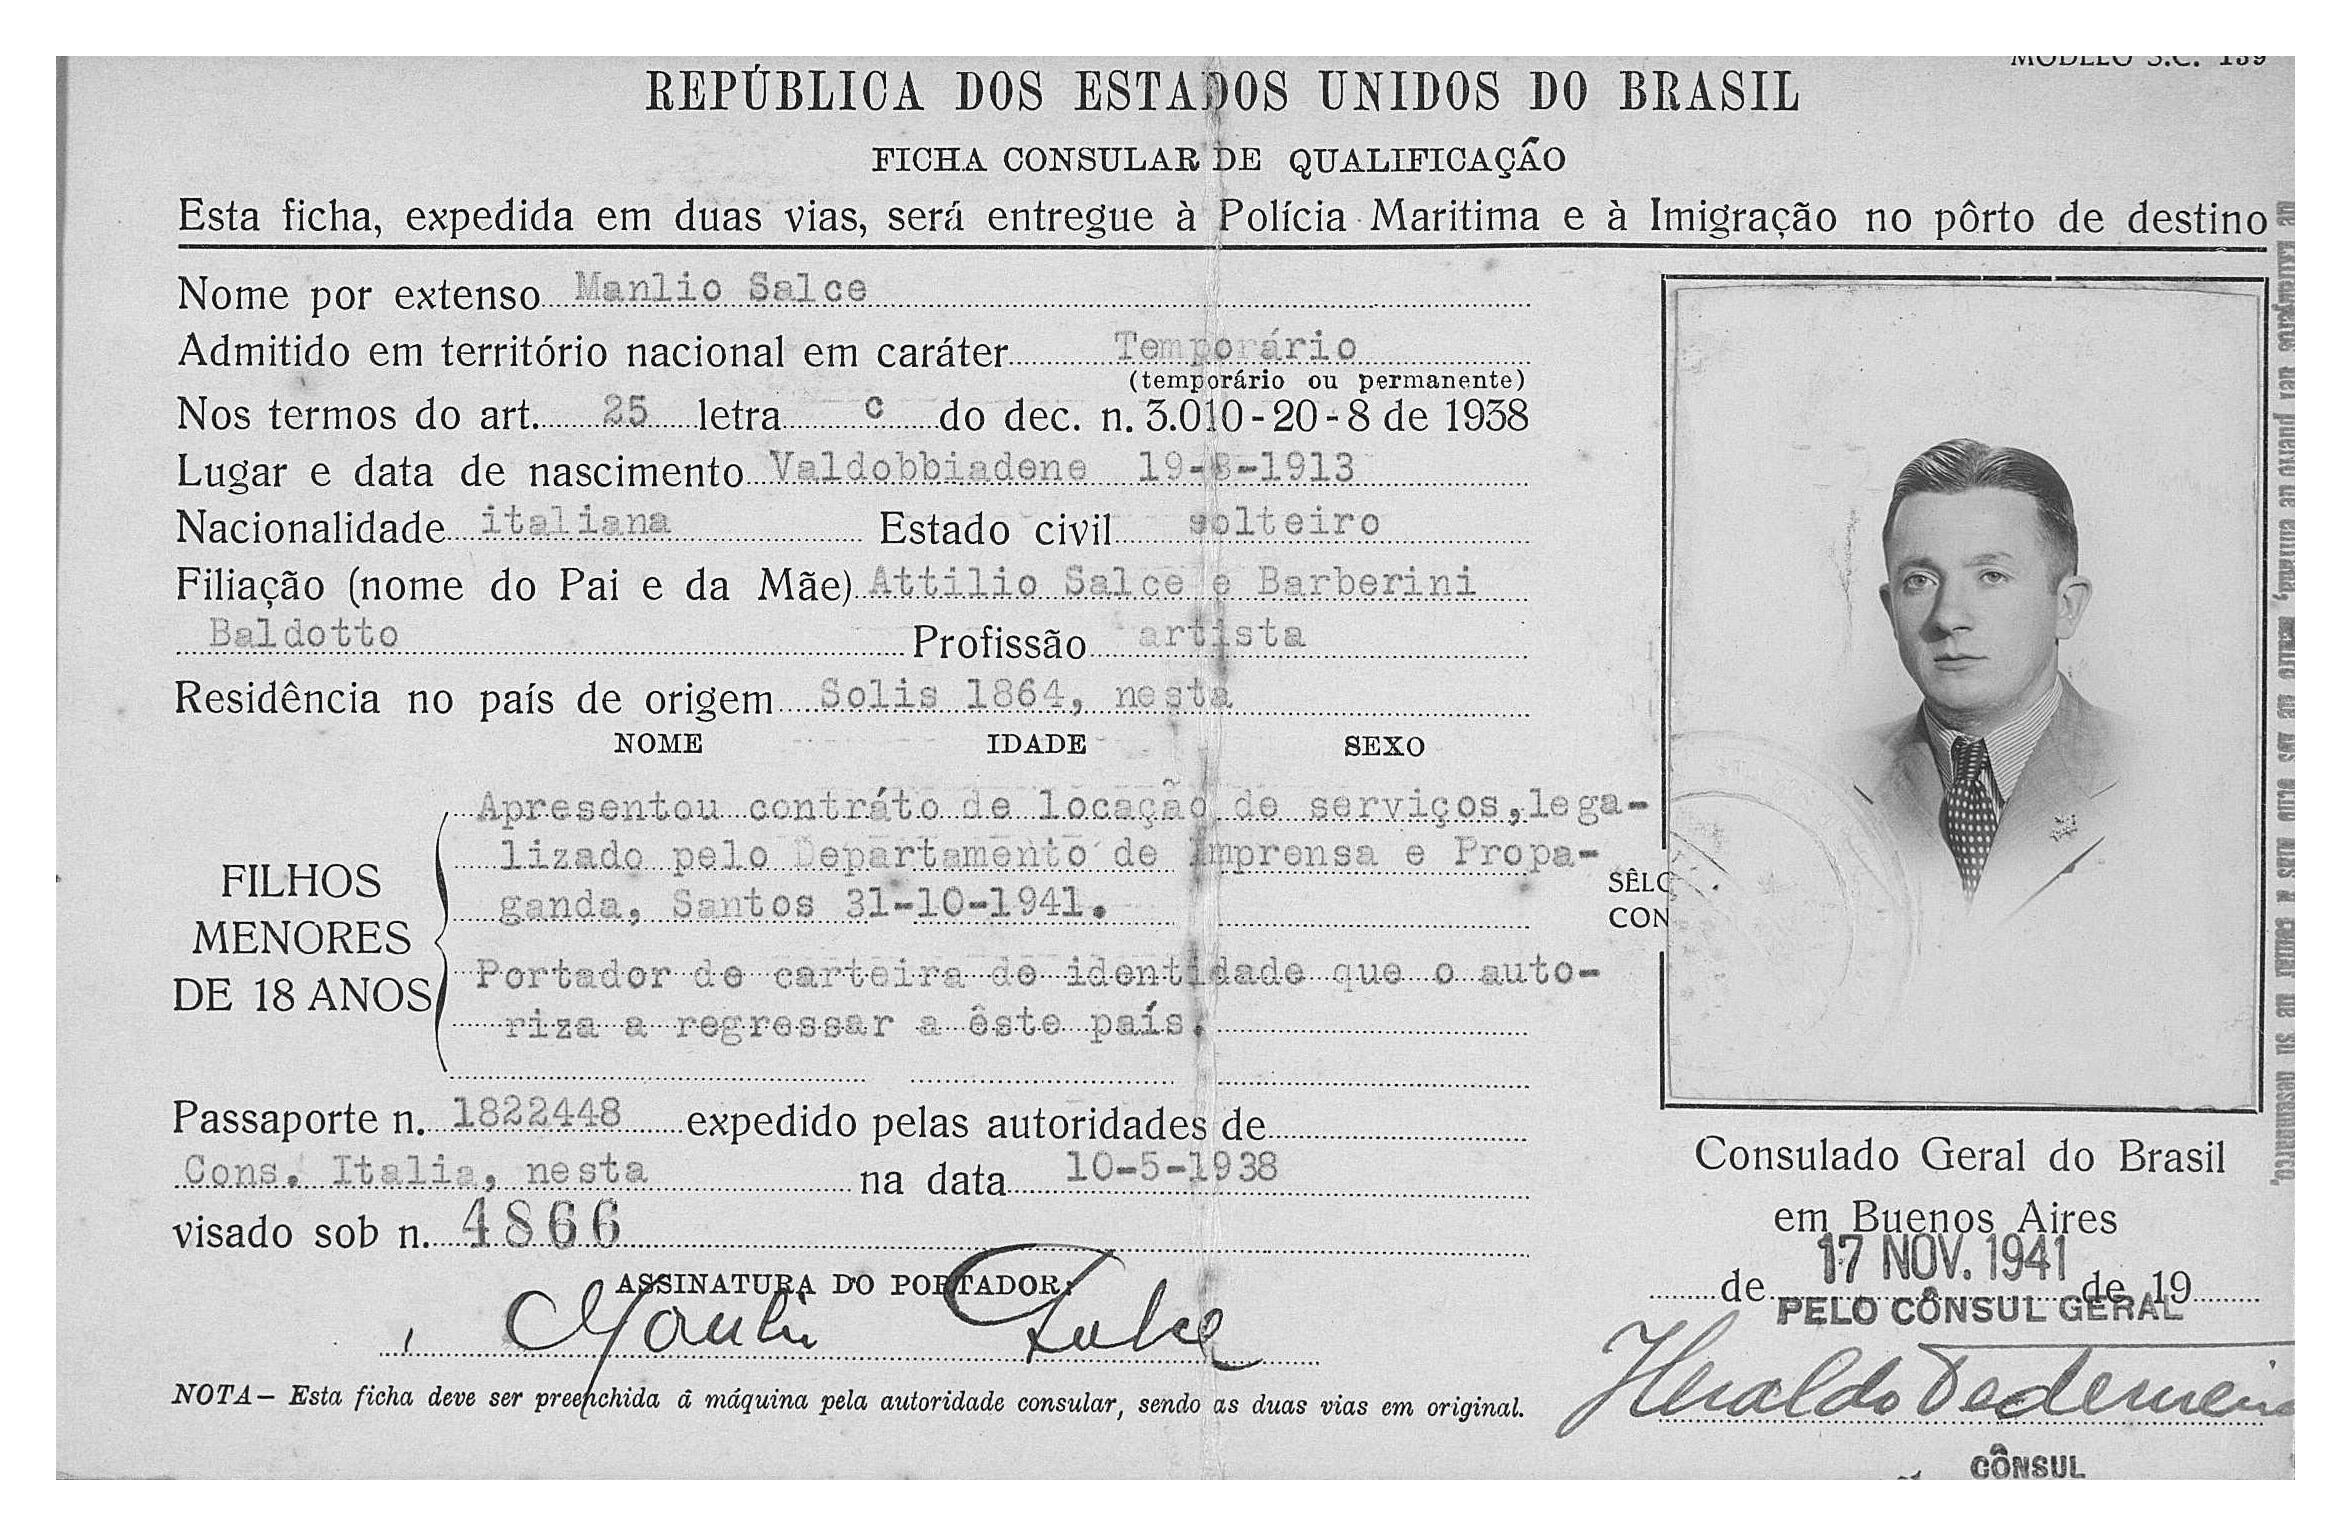 1941-11 - ficha consular - RJ - 01 copy